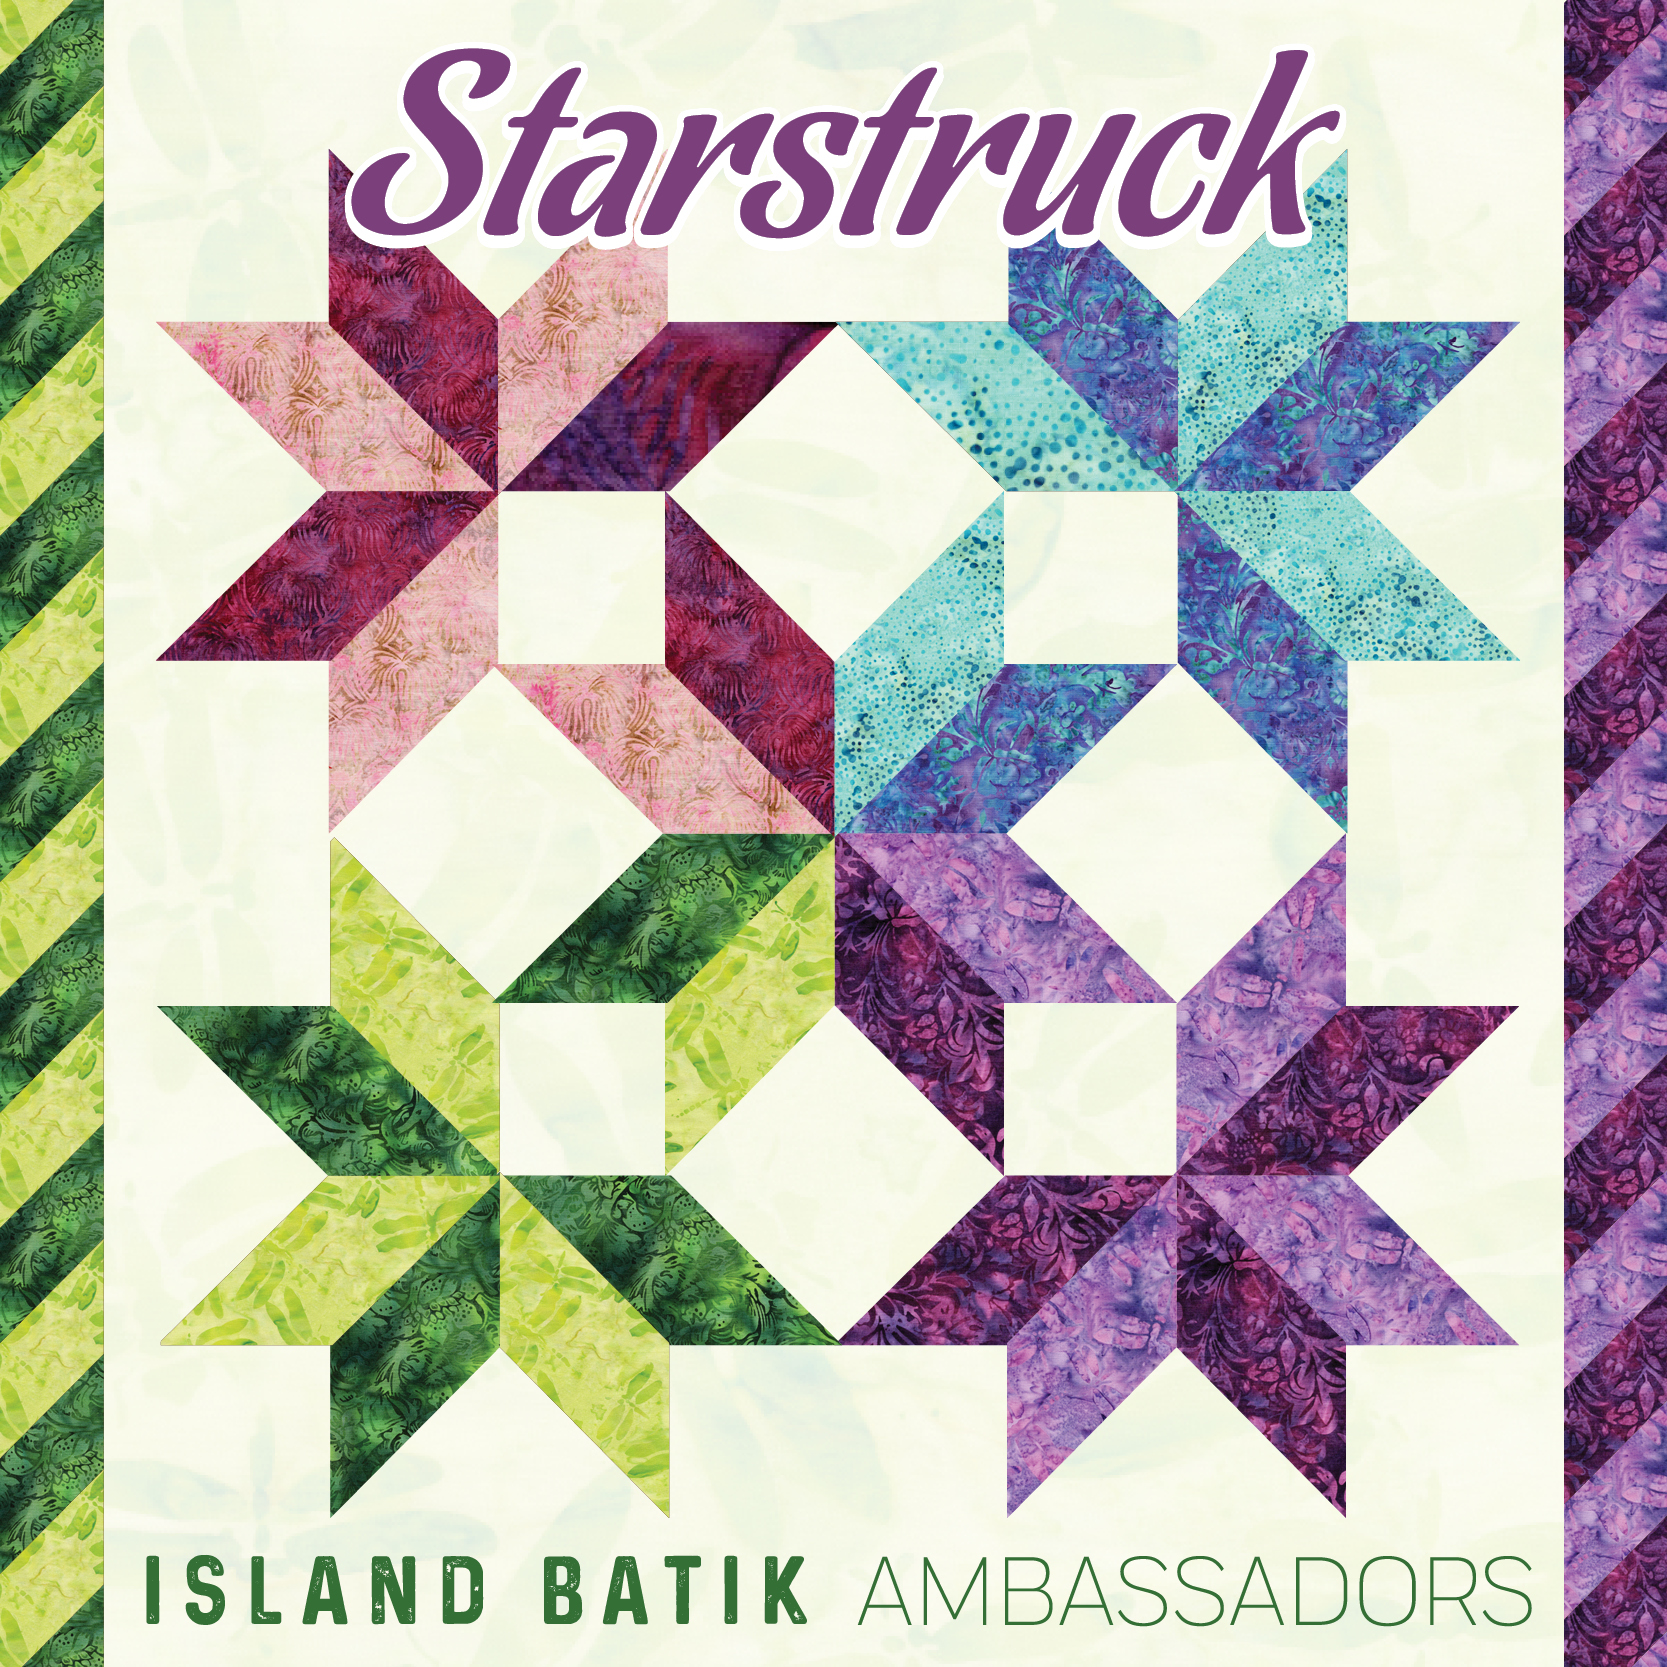 Starstruck copy.jpg